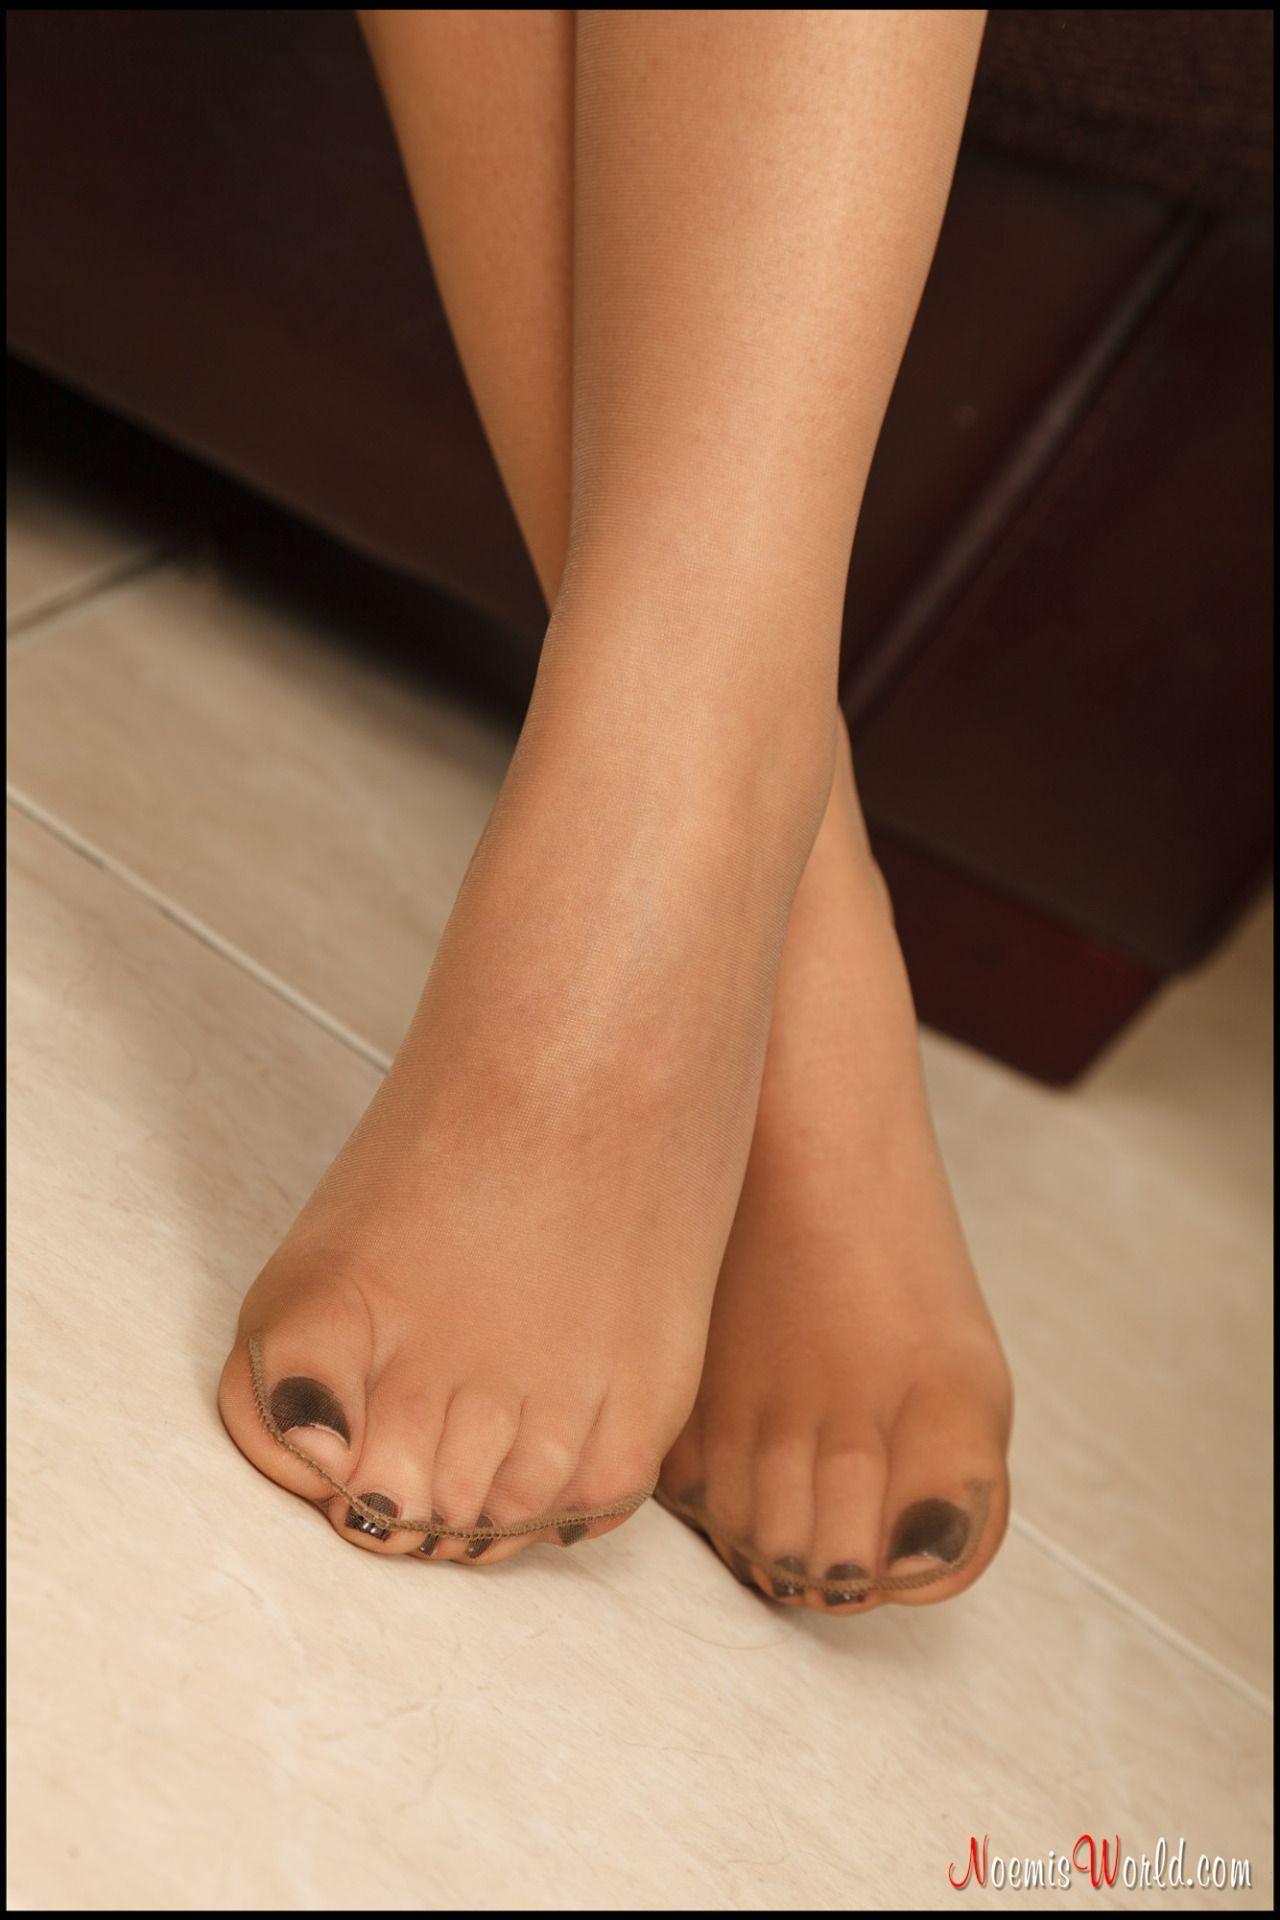 Thongs pantyhose pics